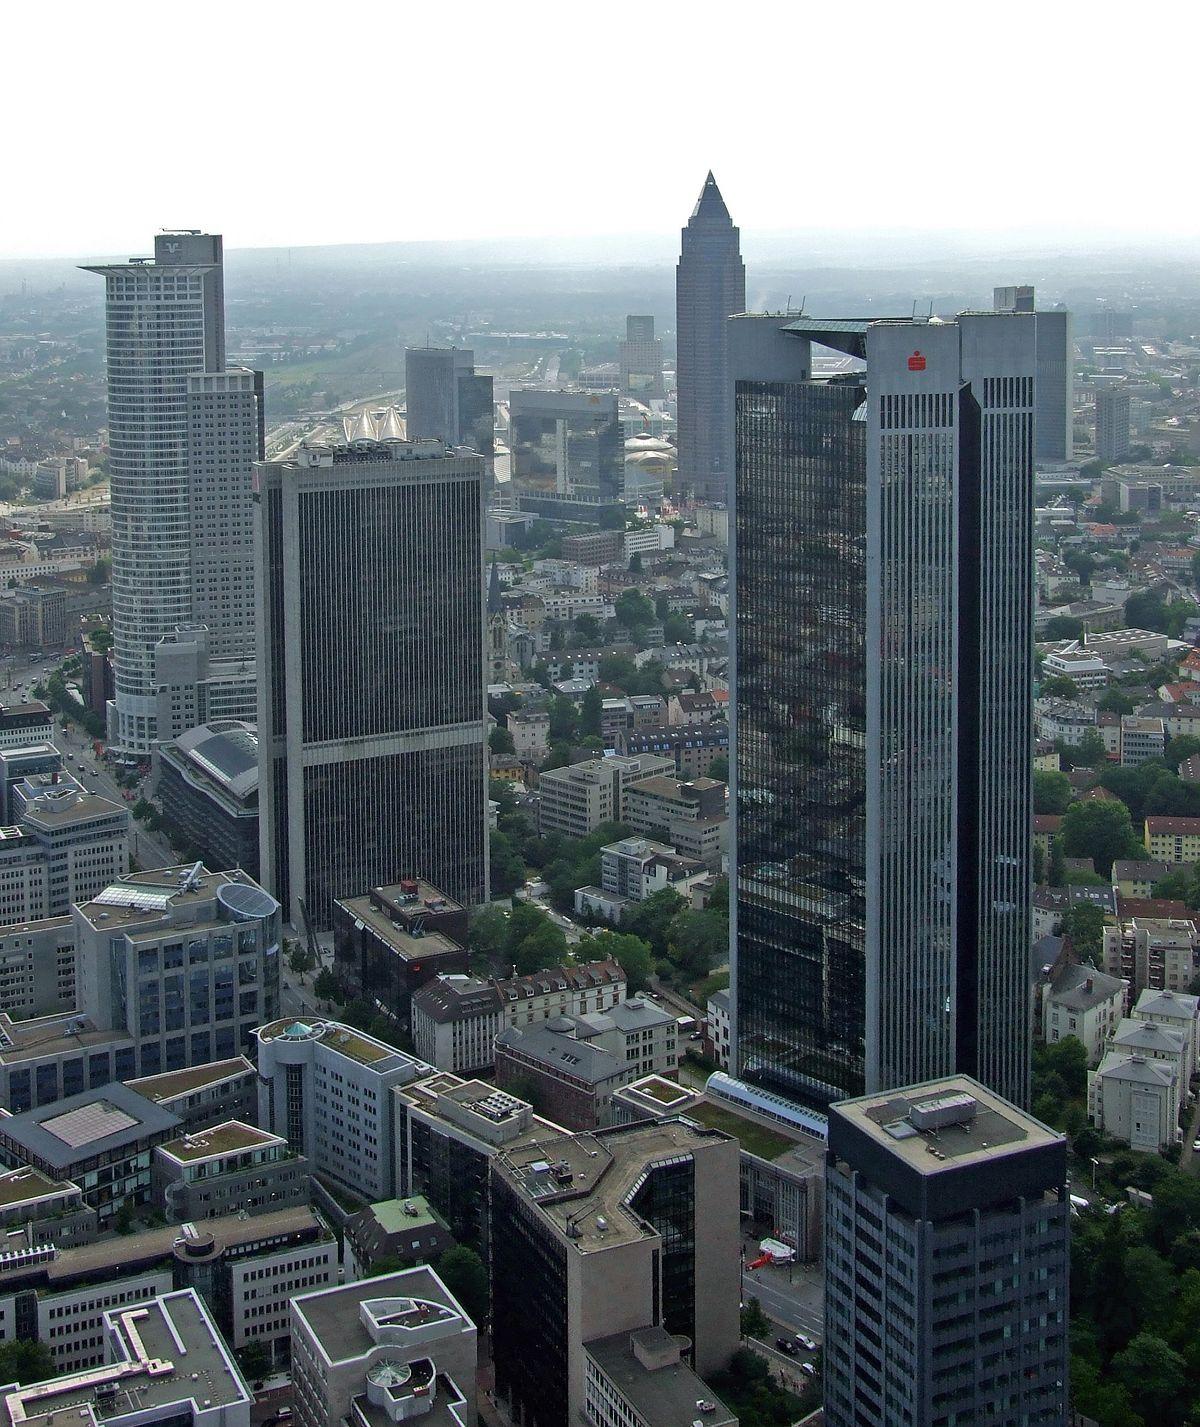 Baufirma Frankfurt marienturm frankfurt am